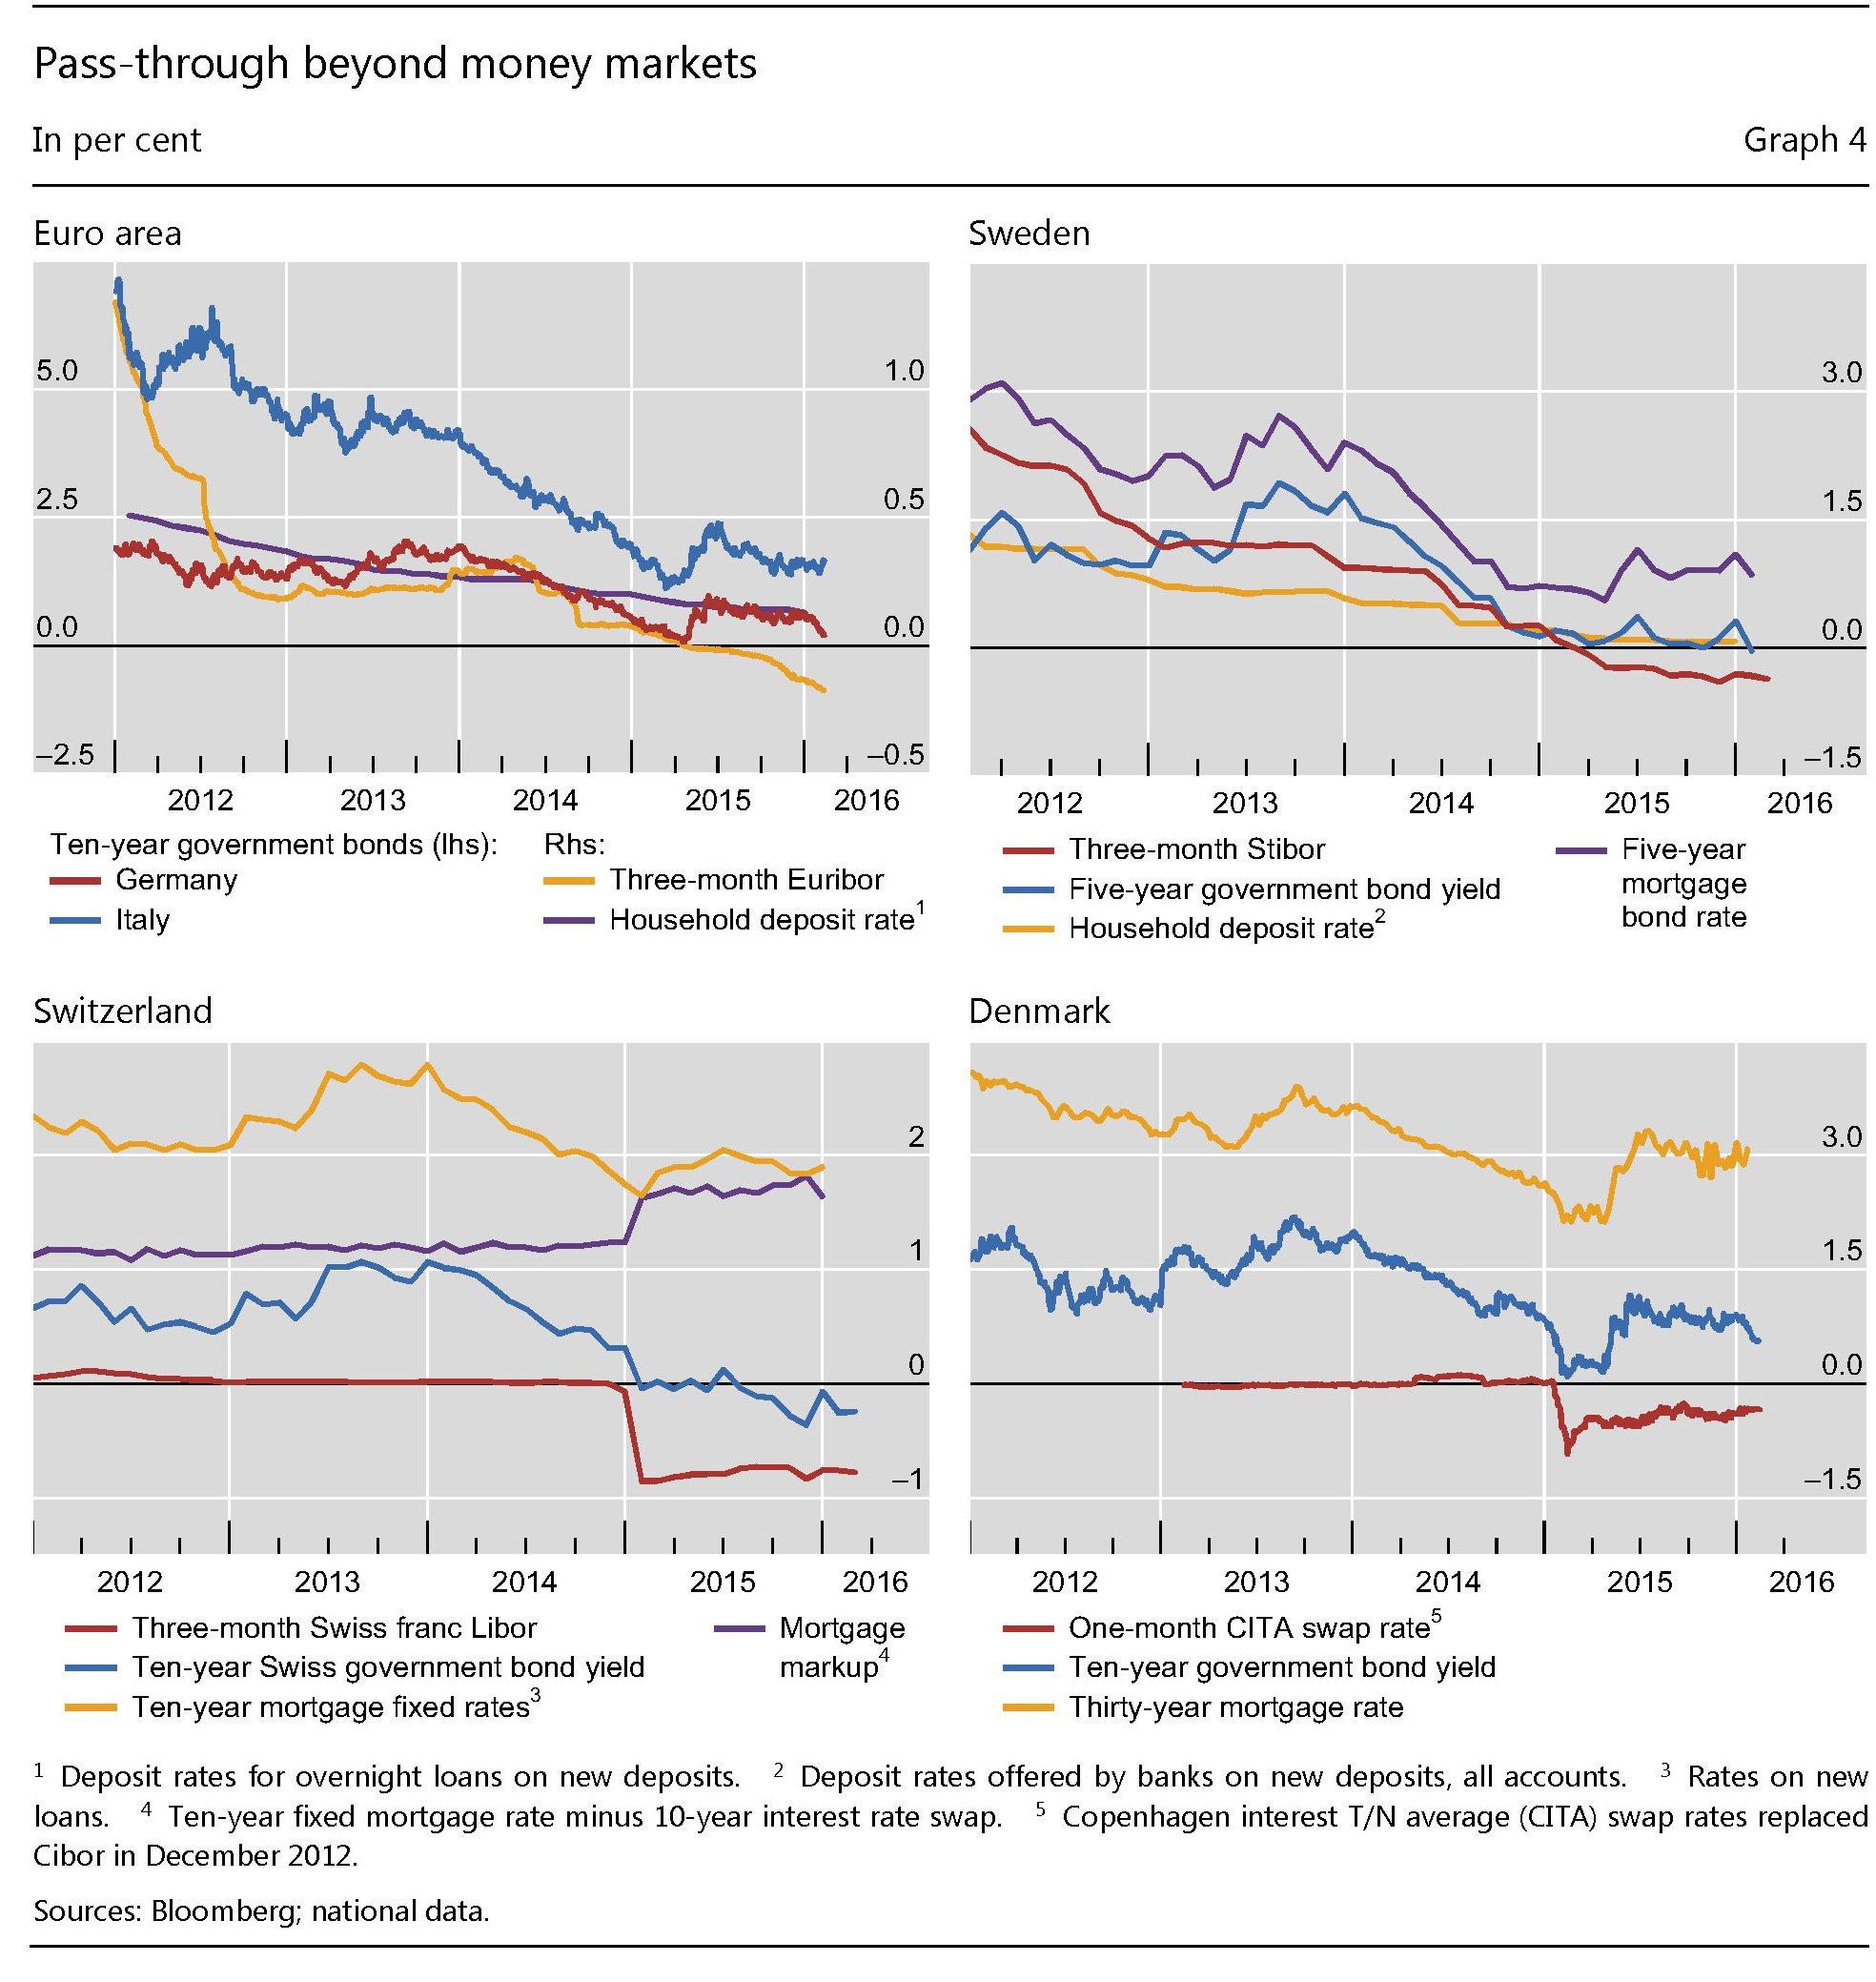 BIS-Quarterly-Review-tassi-fuori-dal-mercato-monetario